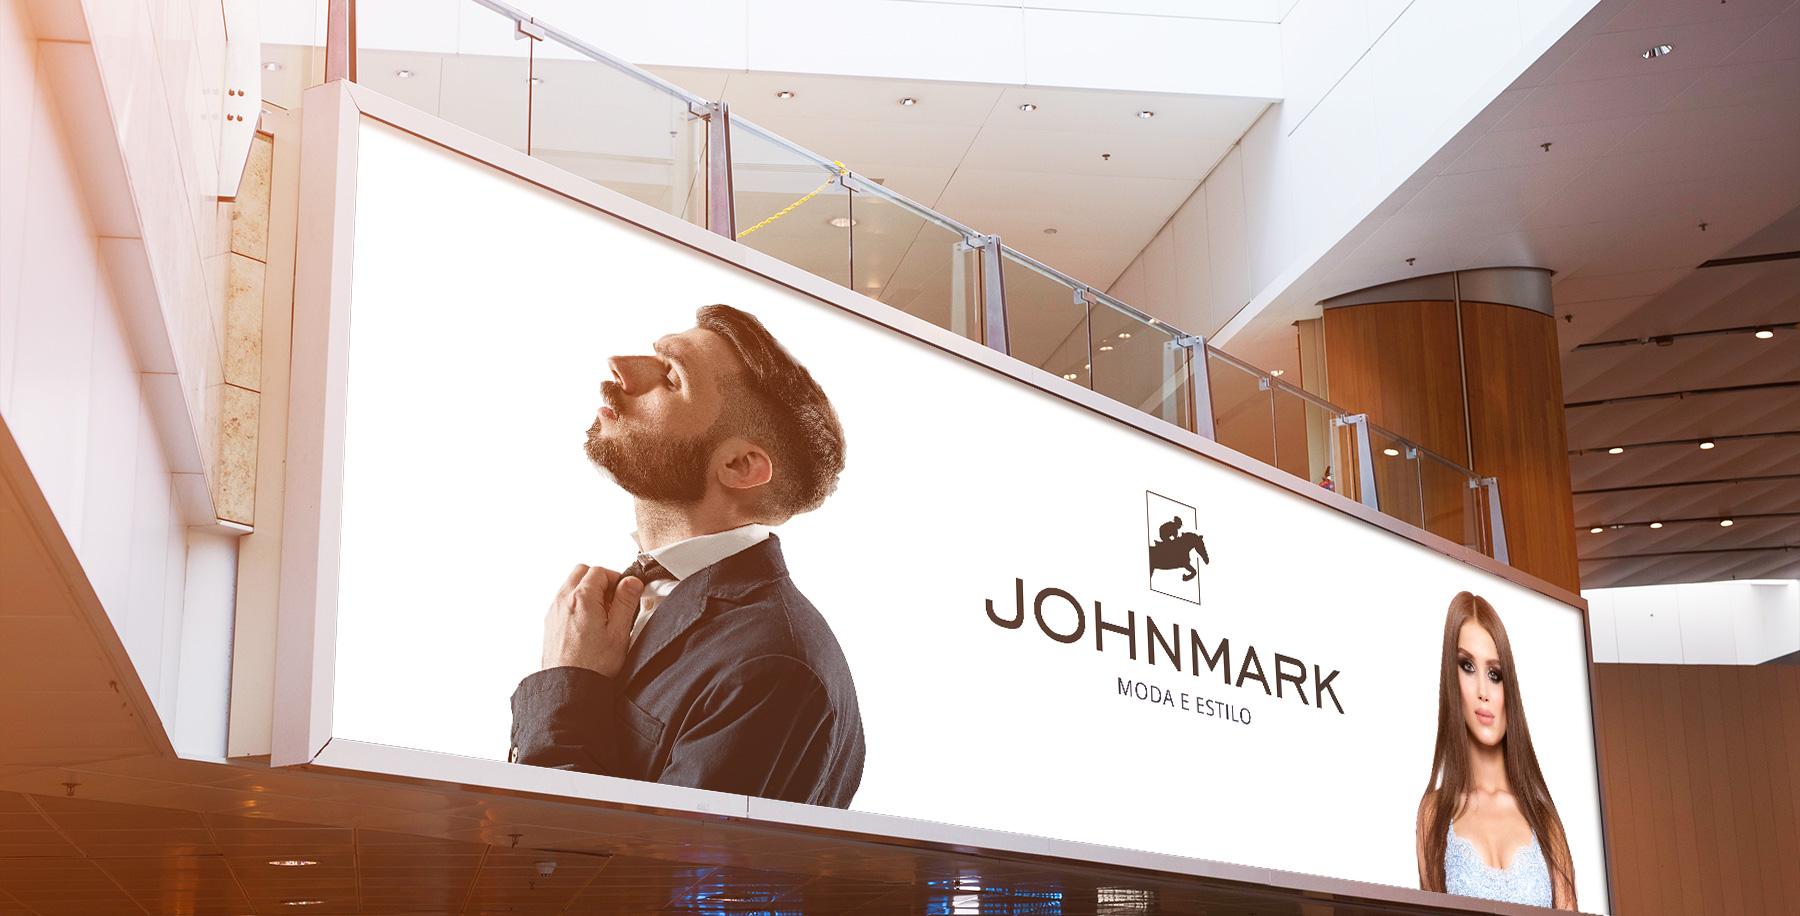 Johnmark Logotipo 4